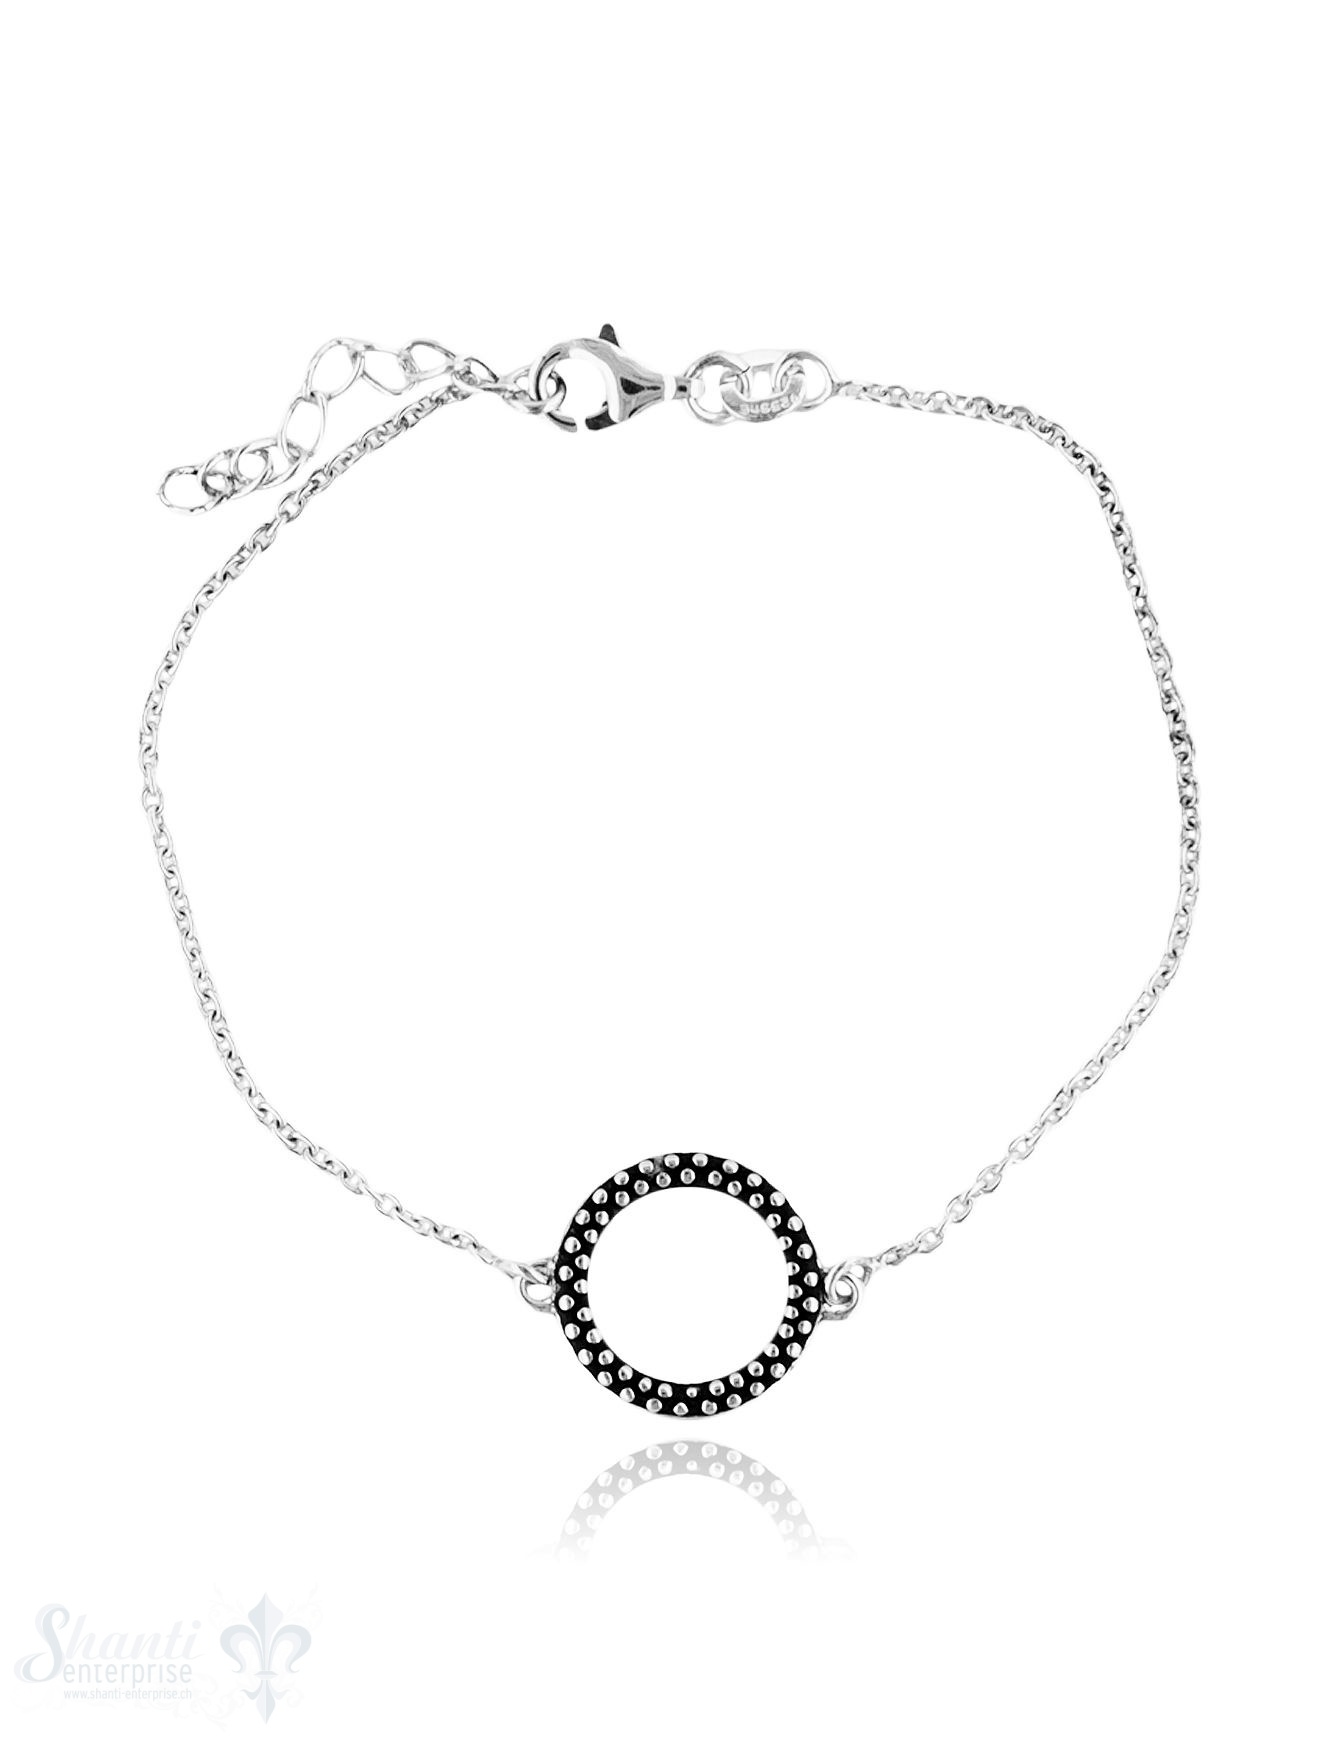 Armkette Anker fein Silber hell mit Kreis getupft